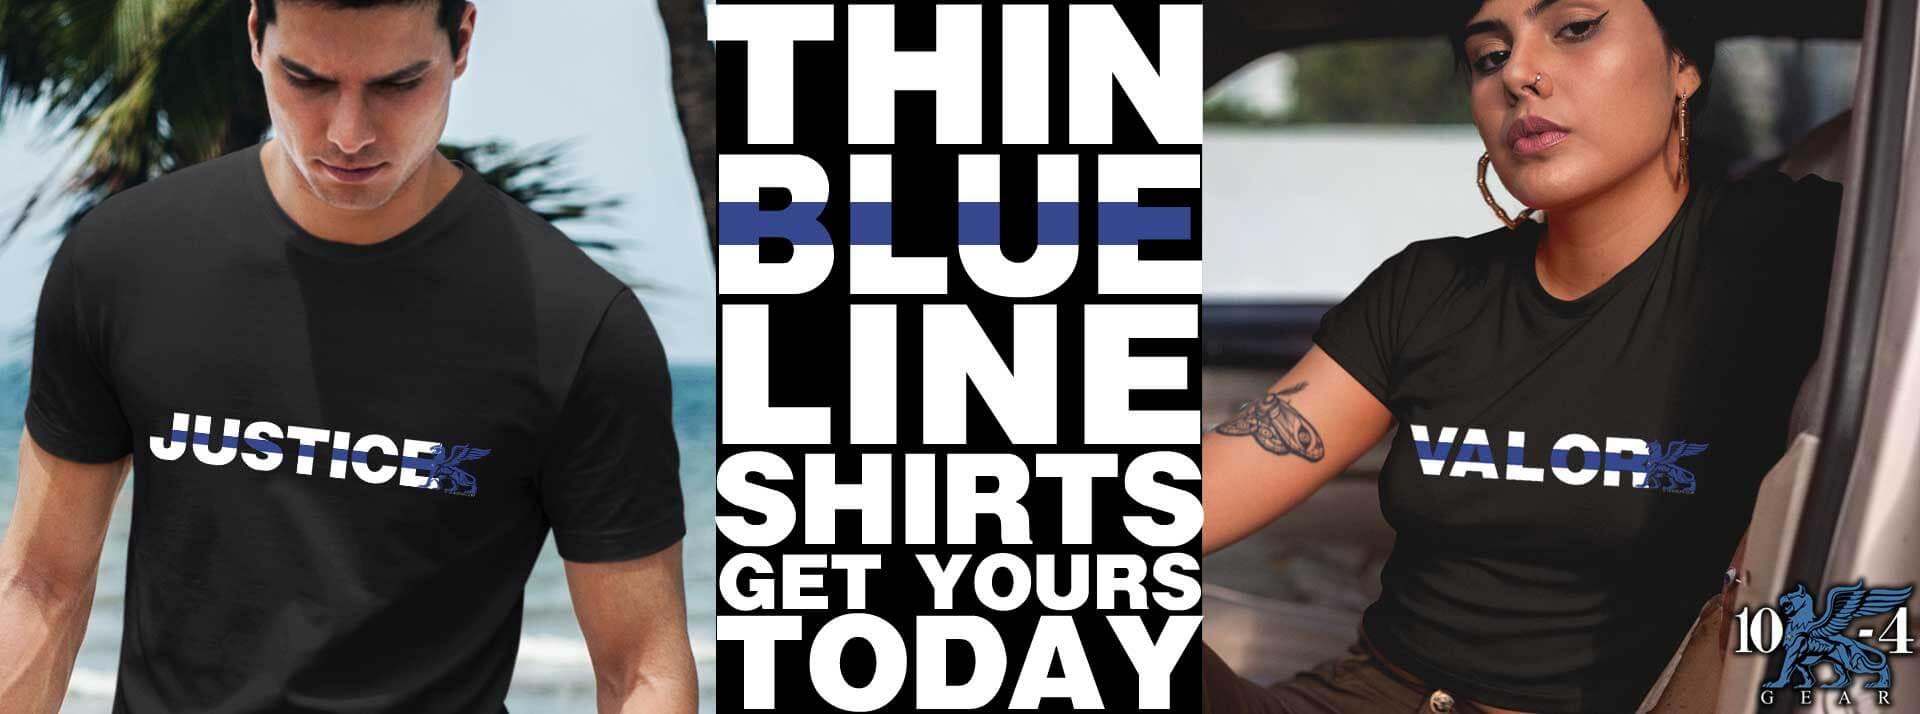 Thin Blue Line Shirts